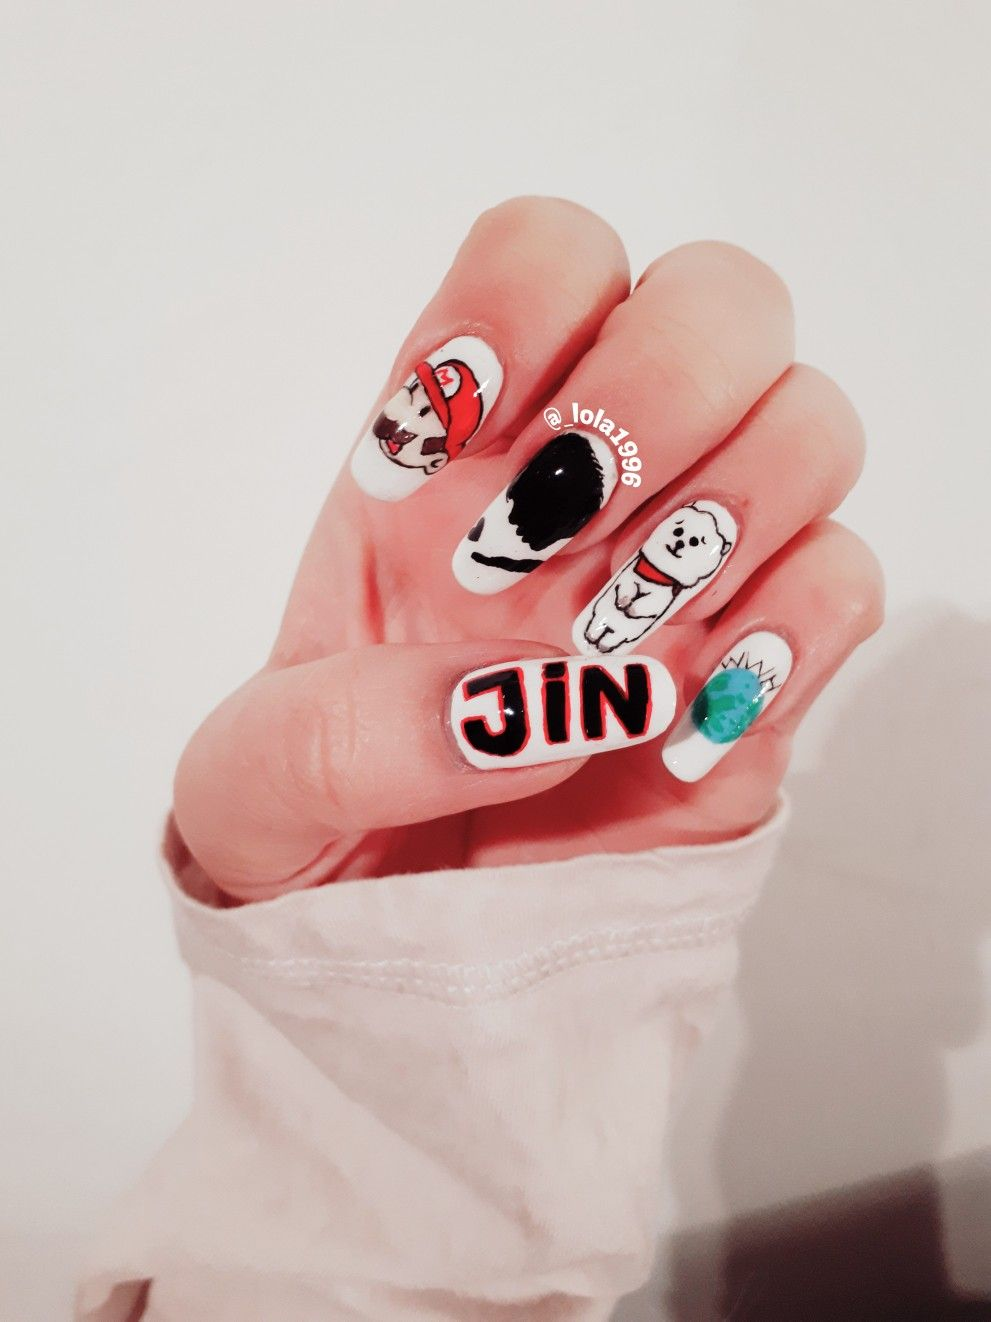 Bts nail art Happy 25th birthday Jin | Bts em 2019 | Nails ...